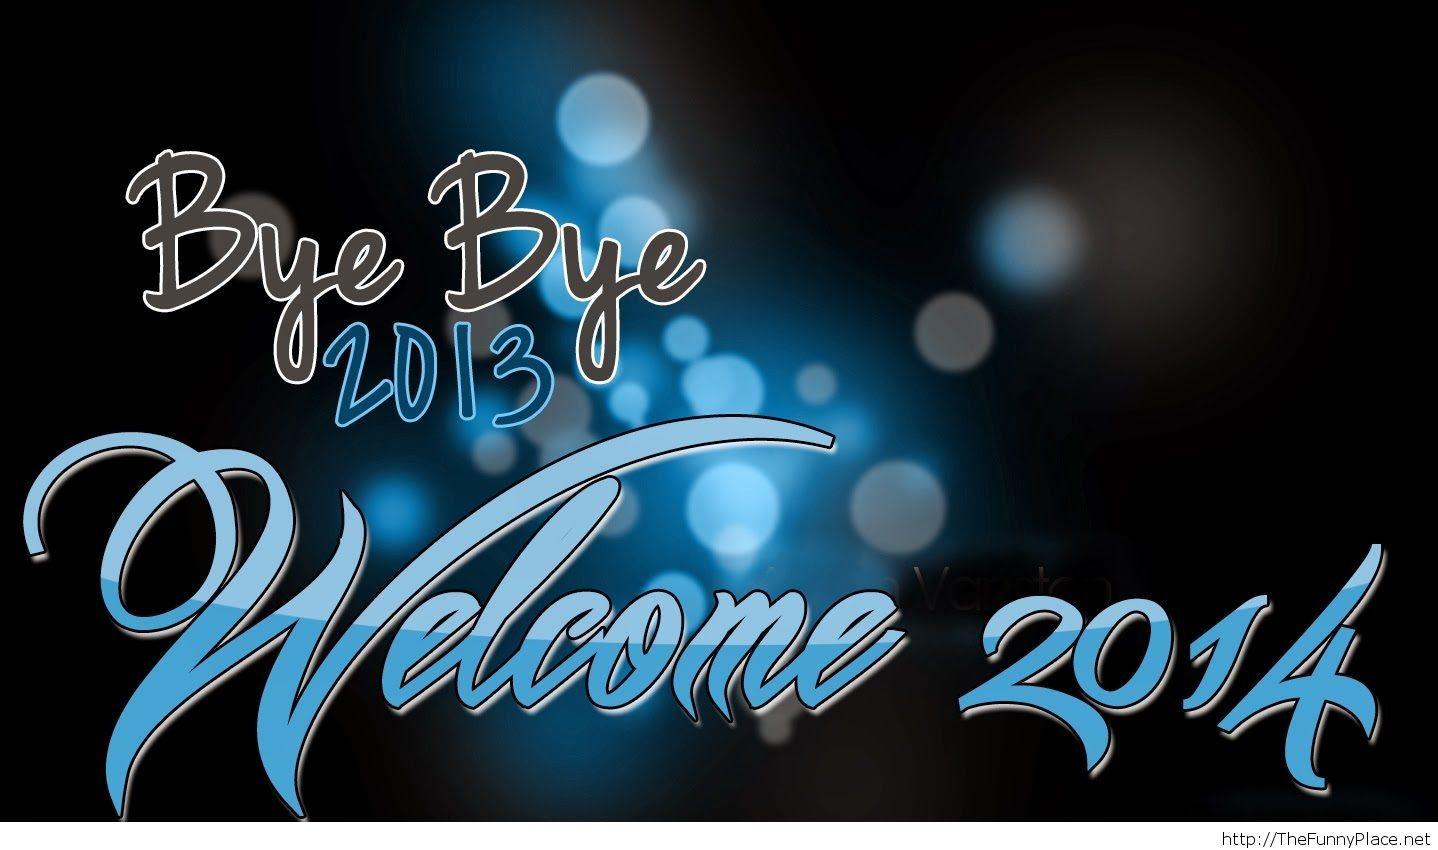 Good bye 2013 Welcome 2014 wallpaper